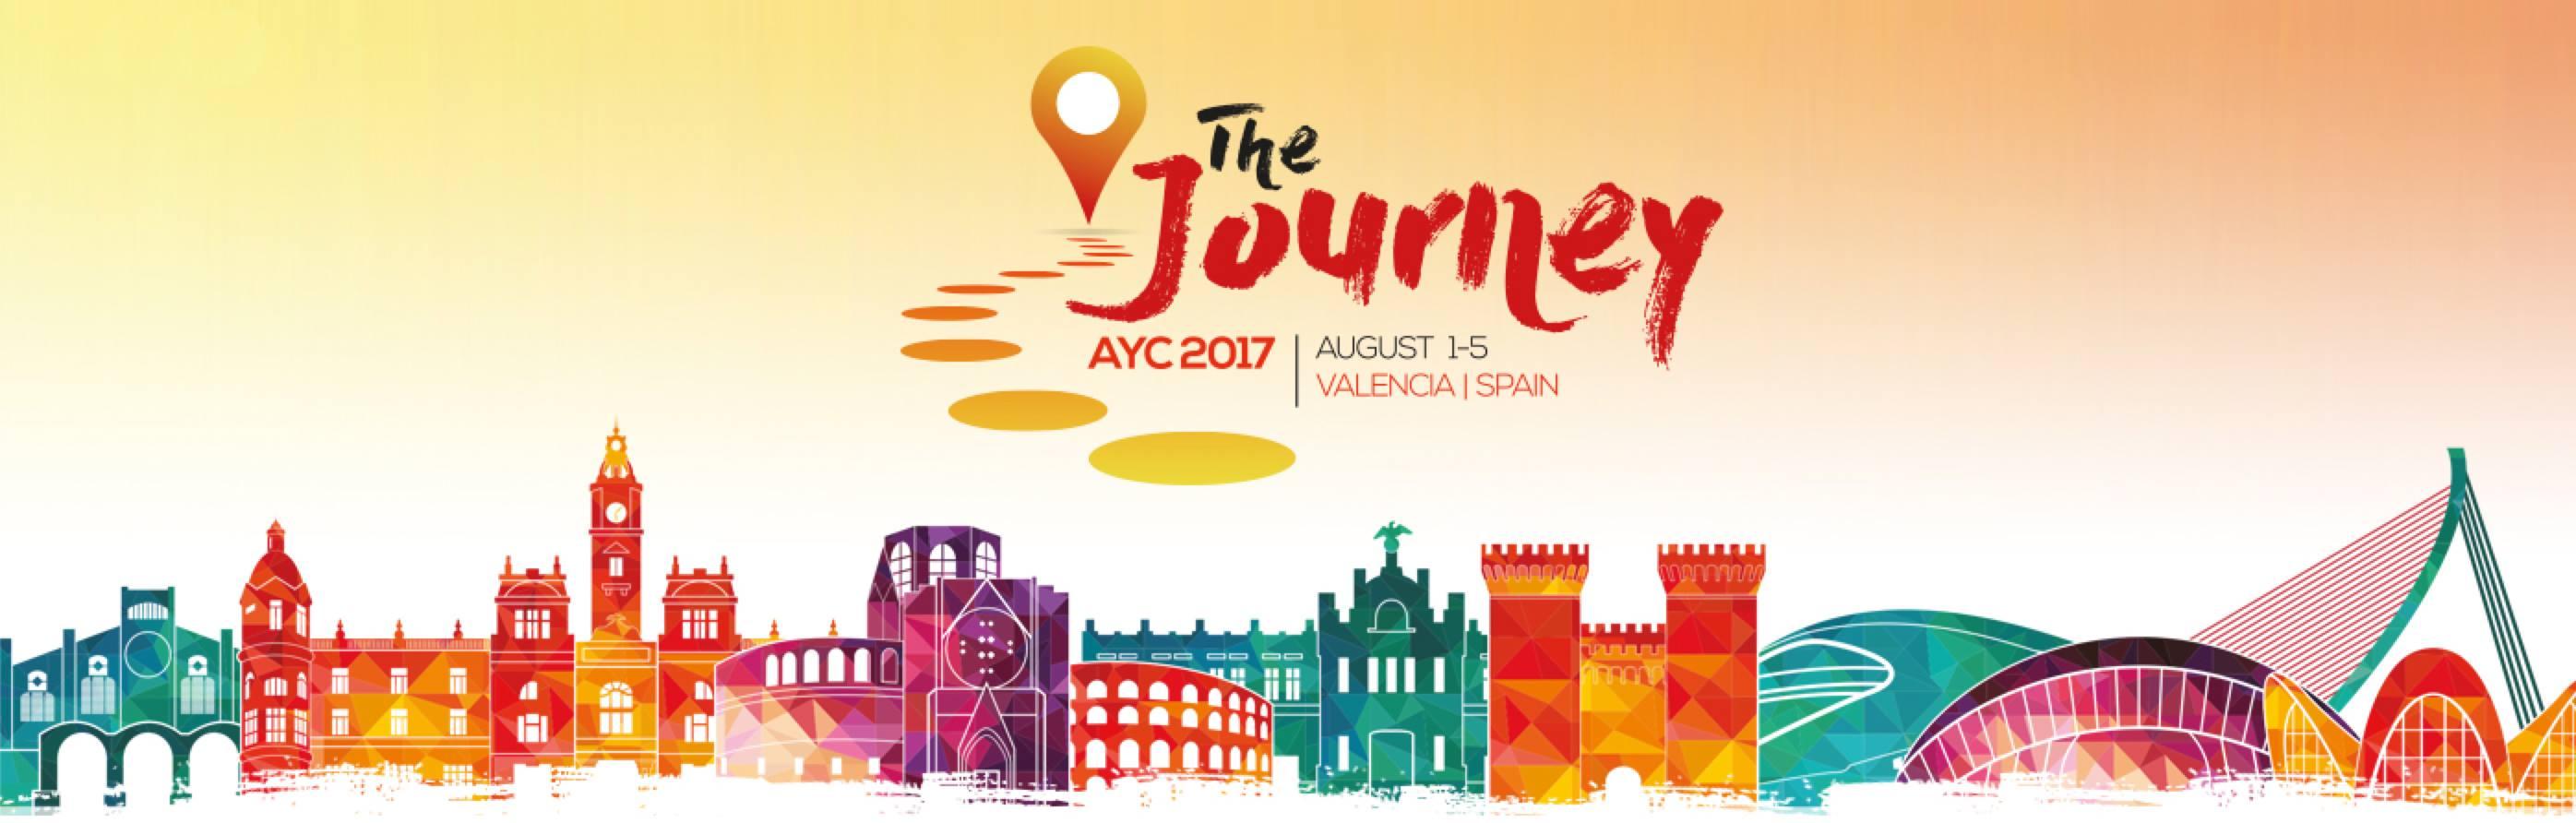 Adventist Youth - Youth Congress: Valencia 2017